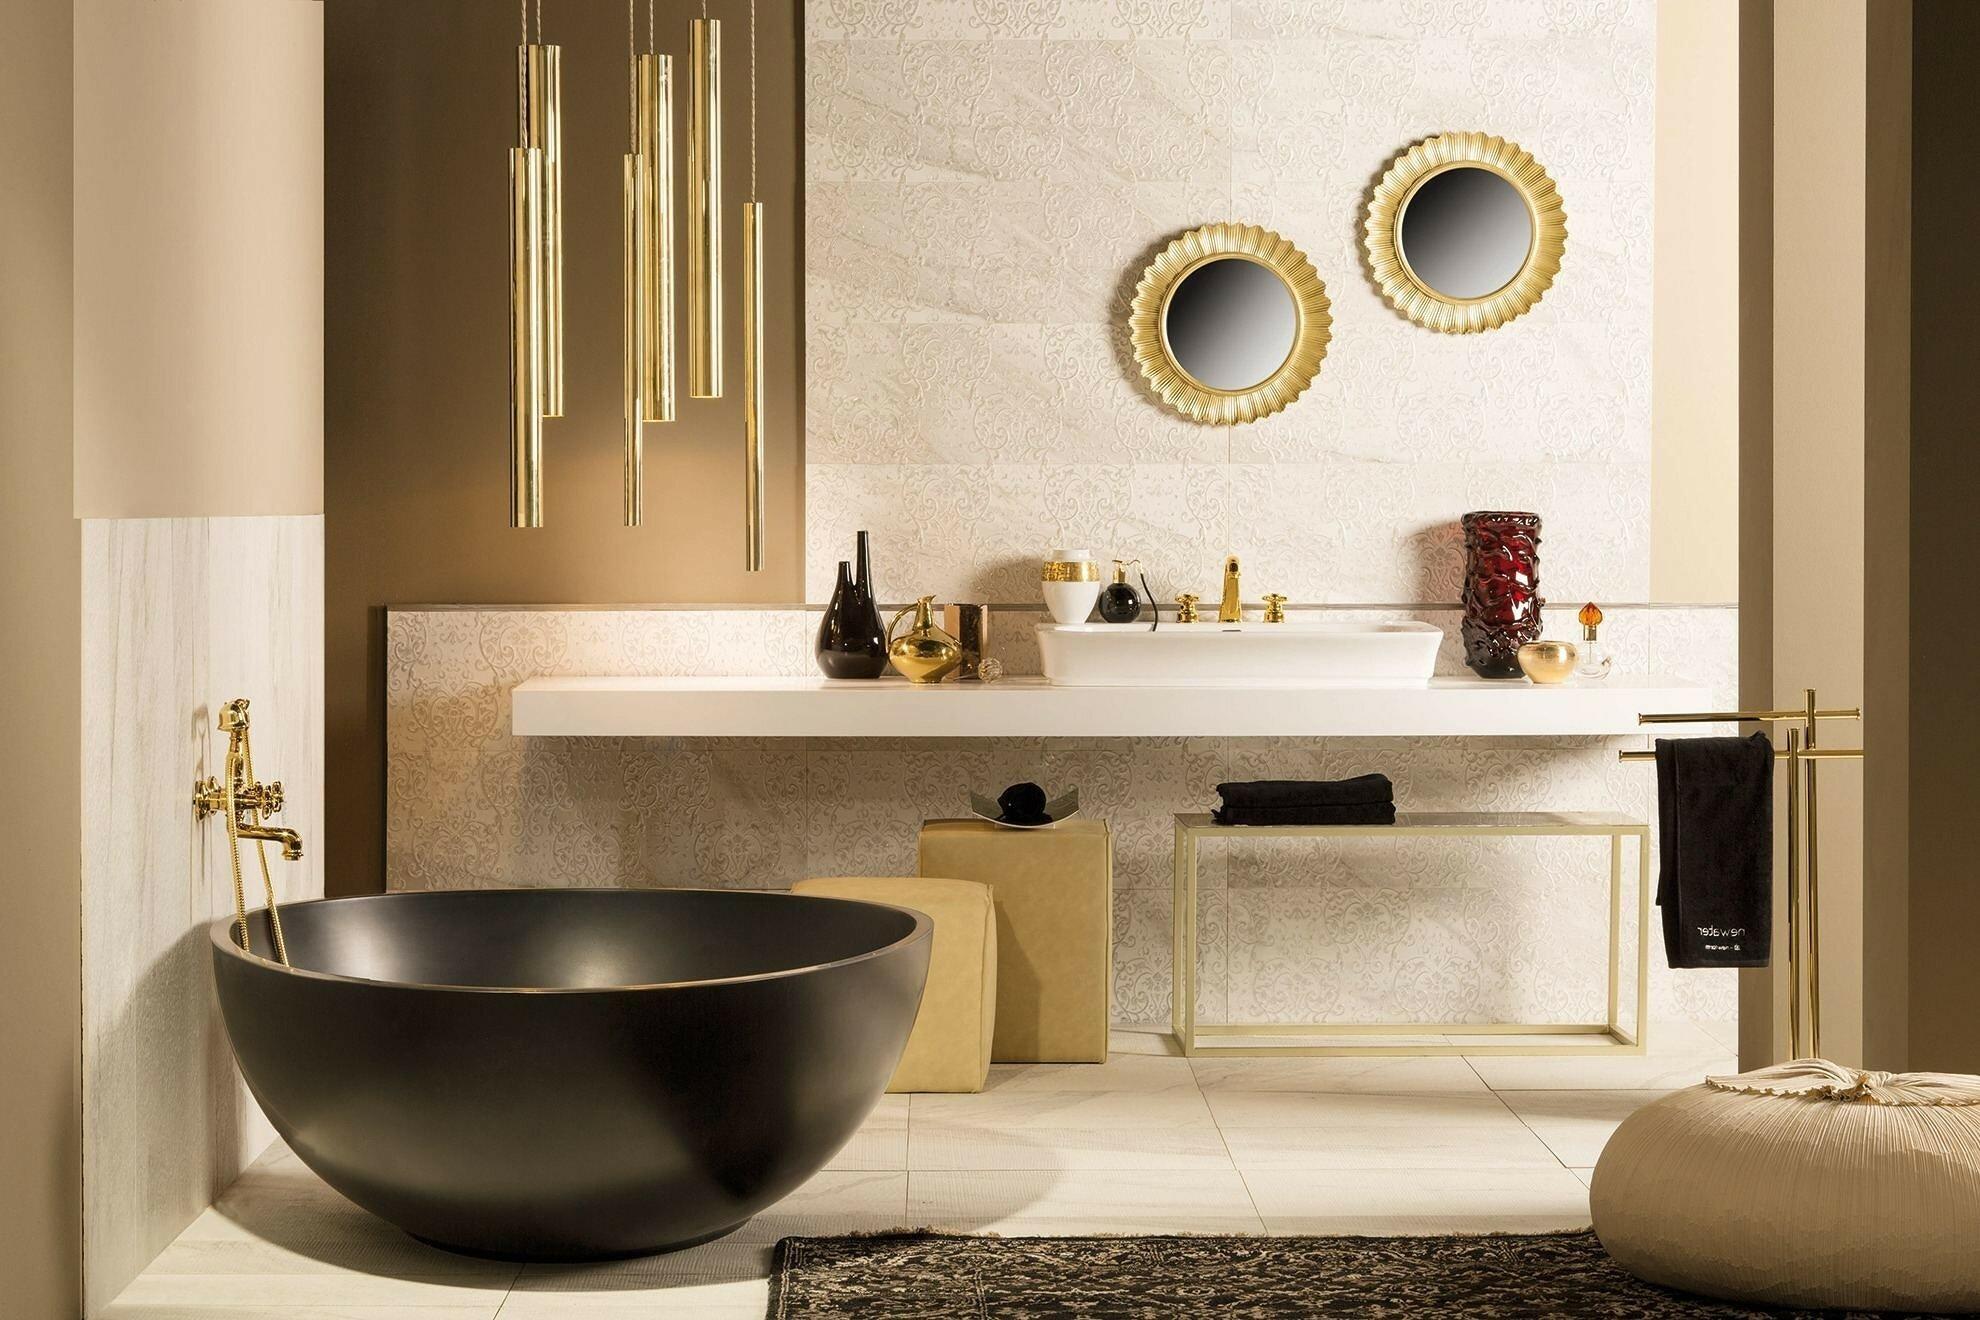 Популярный дизайн ванной комнаты 2021